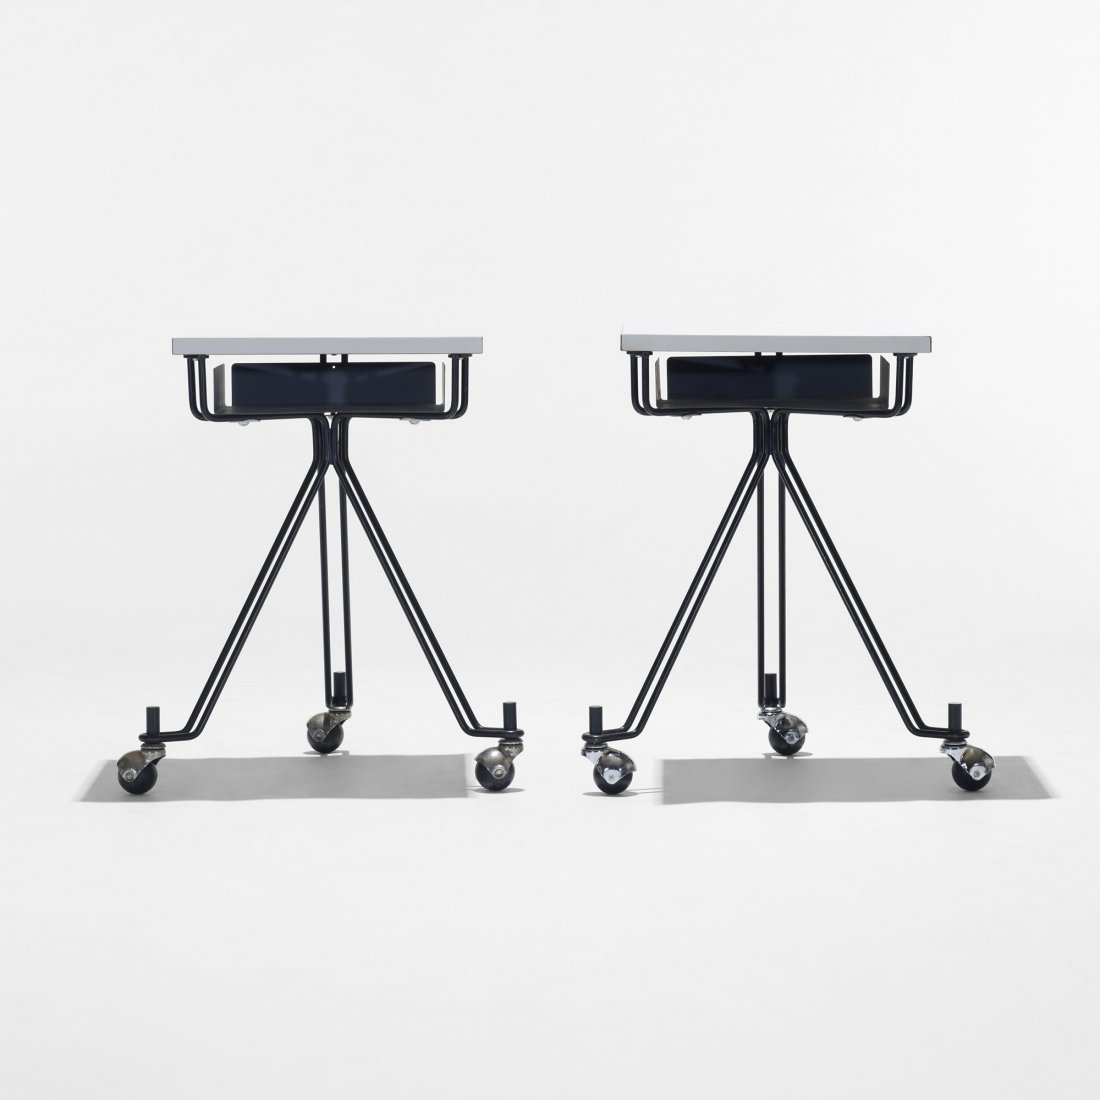 114: Eliot Noyes and Associates telephone tables, pair